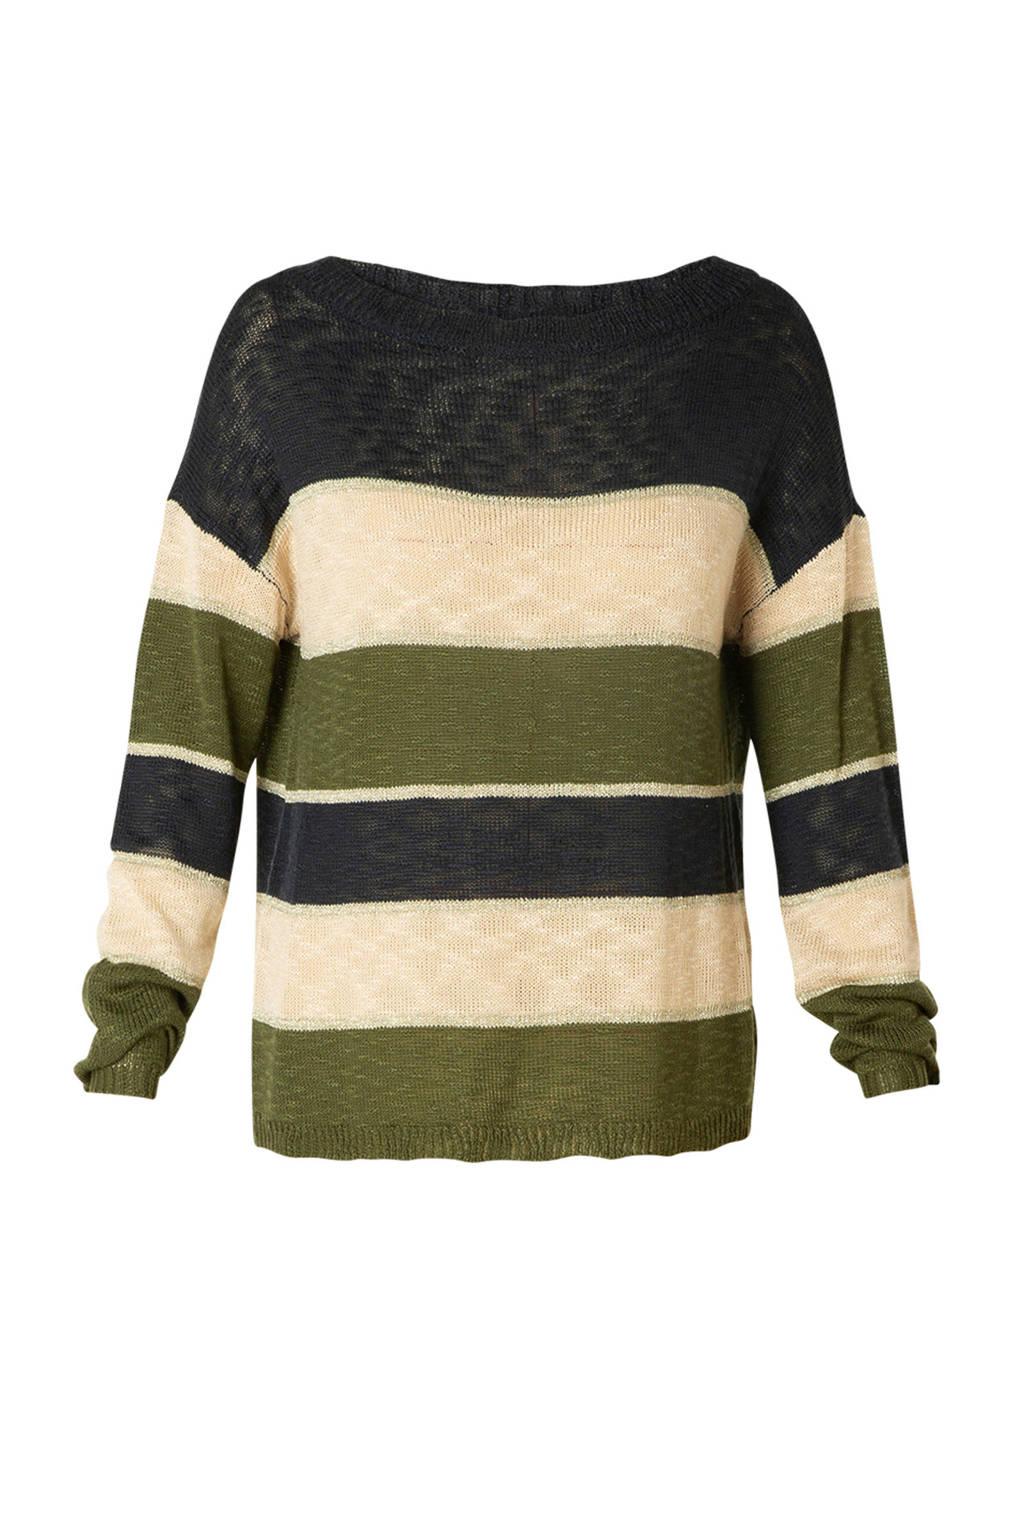 Ivy Beau gestreepte gebreide trui olijfgroen/ecru/donkerblauw, Olijfgroen/ecru/donkerblauw